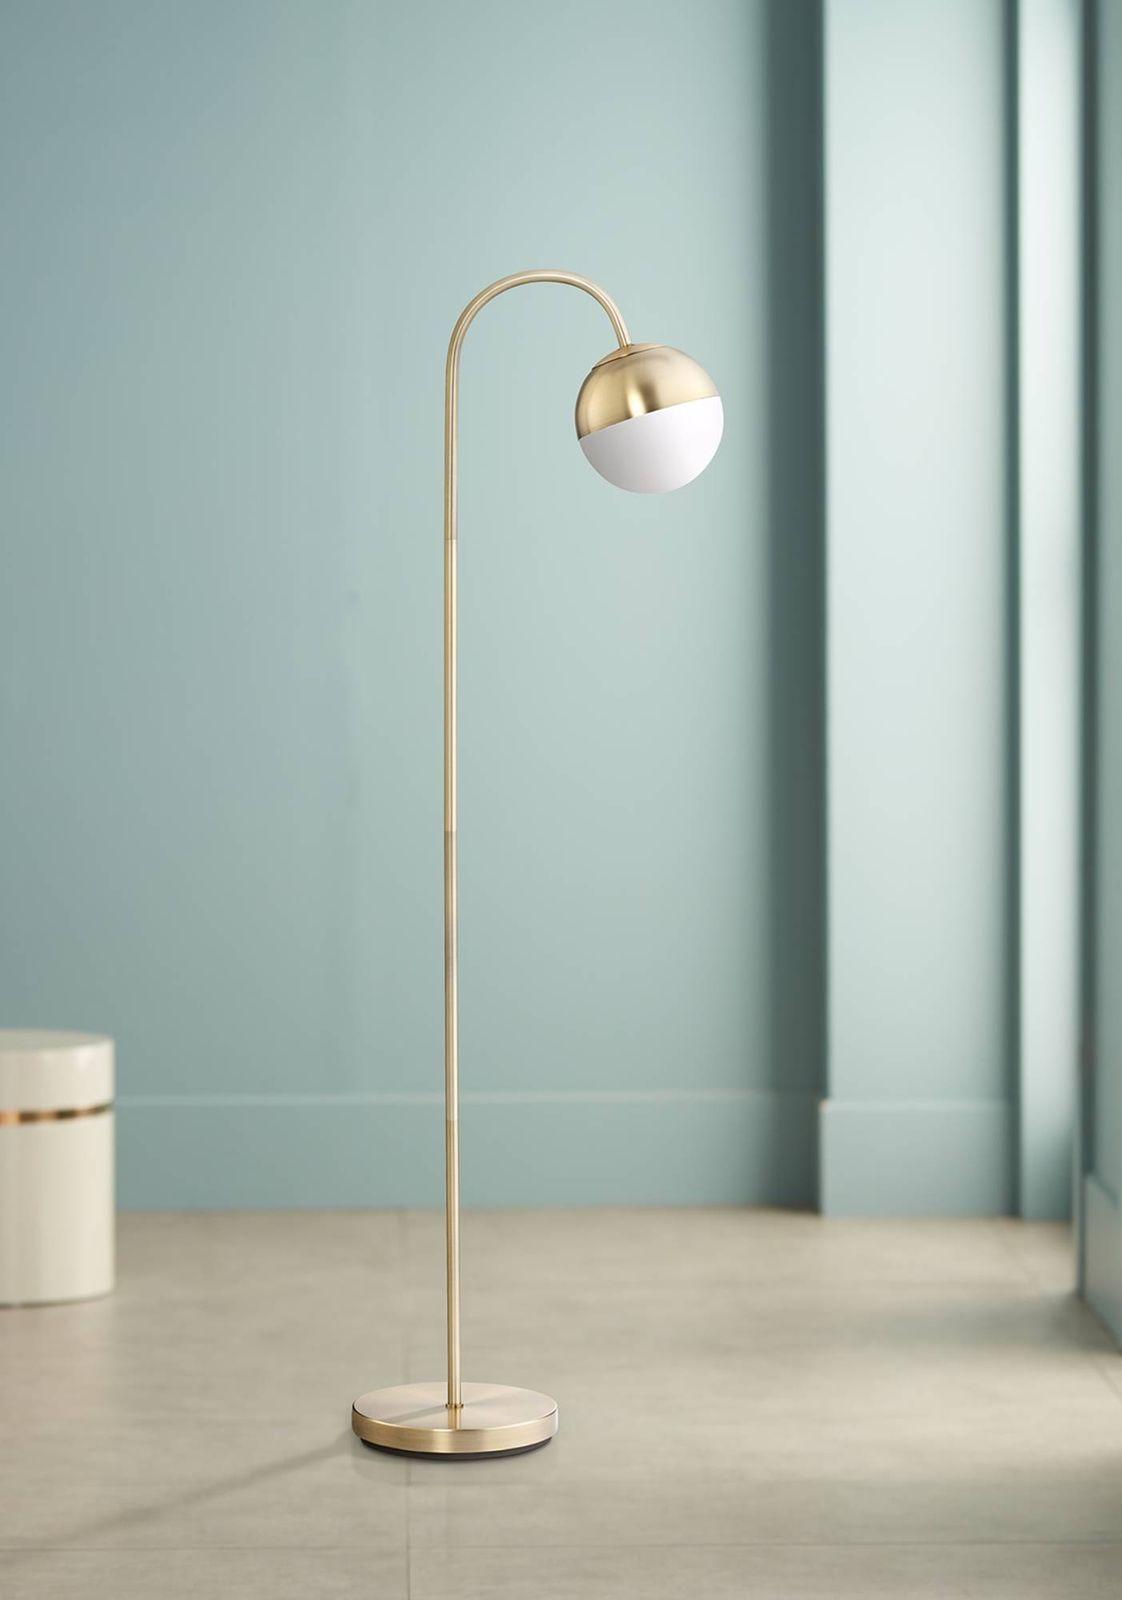 Mid Century Modern Floor Lamp Brass Round White Glass Globe For Living Room Ebay With Images Mid Century Modern Floor Lamps Modern Floor Lamps Brass Floor Lamp